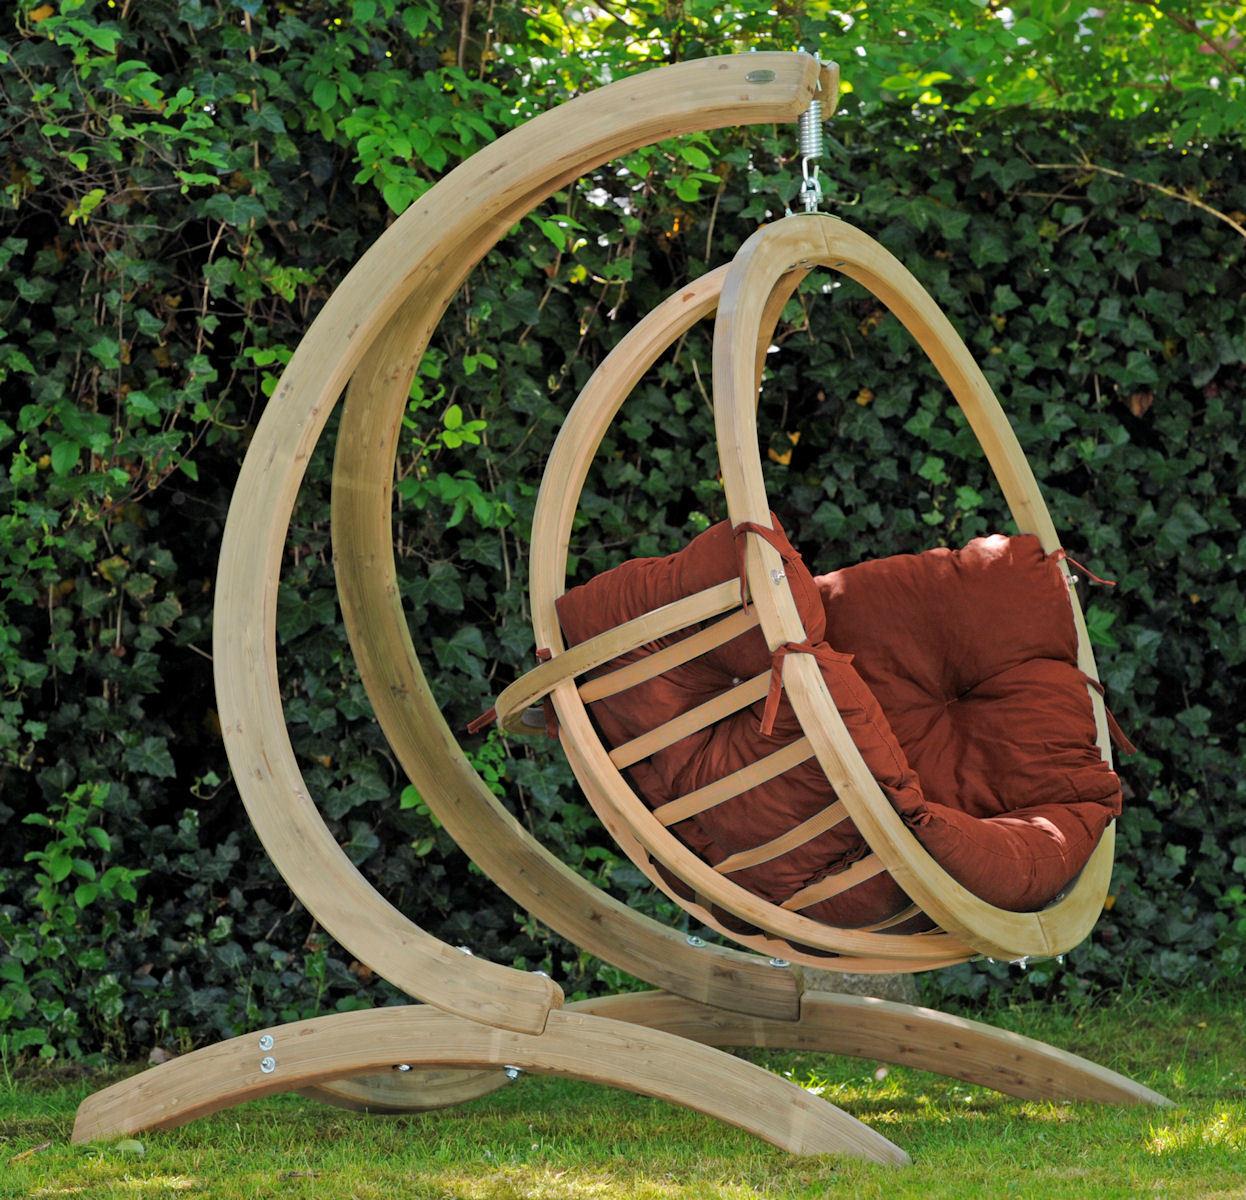 Amazonas Globo Chair Hängekugel Hängesessel Kugel Kugelgestell Hängesitz Auswahl Auswahl Auswahl 0a6244